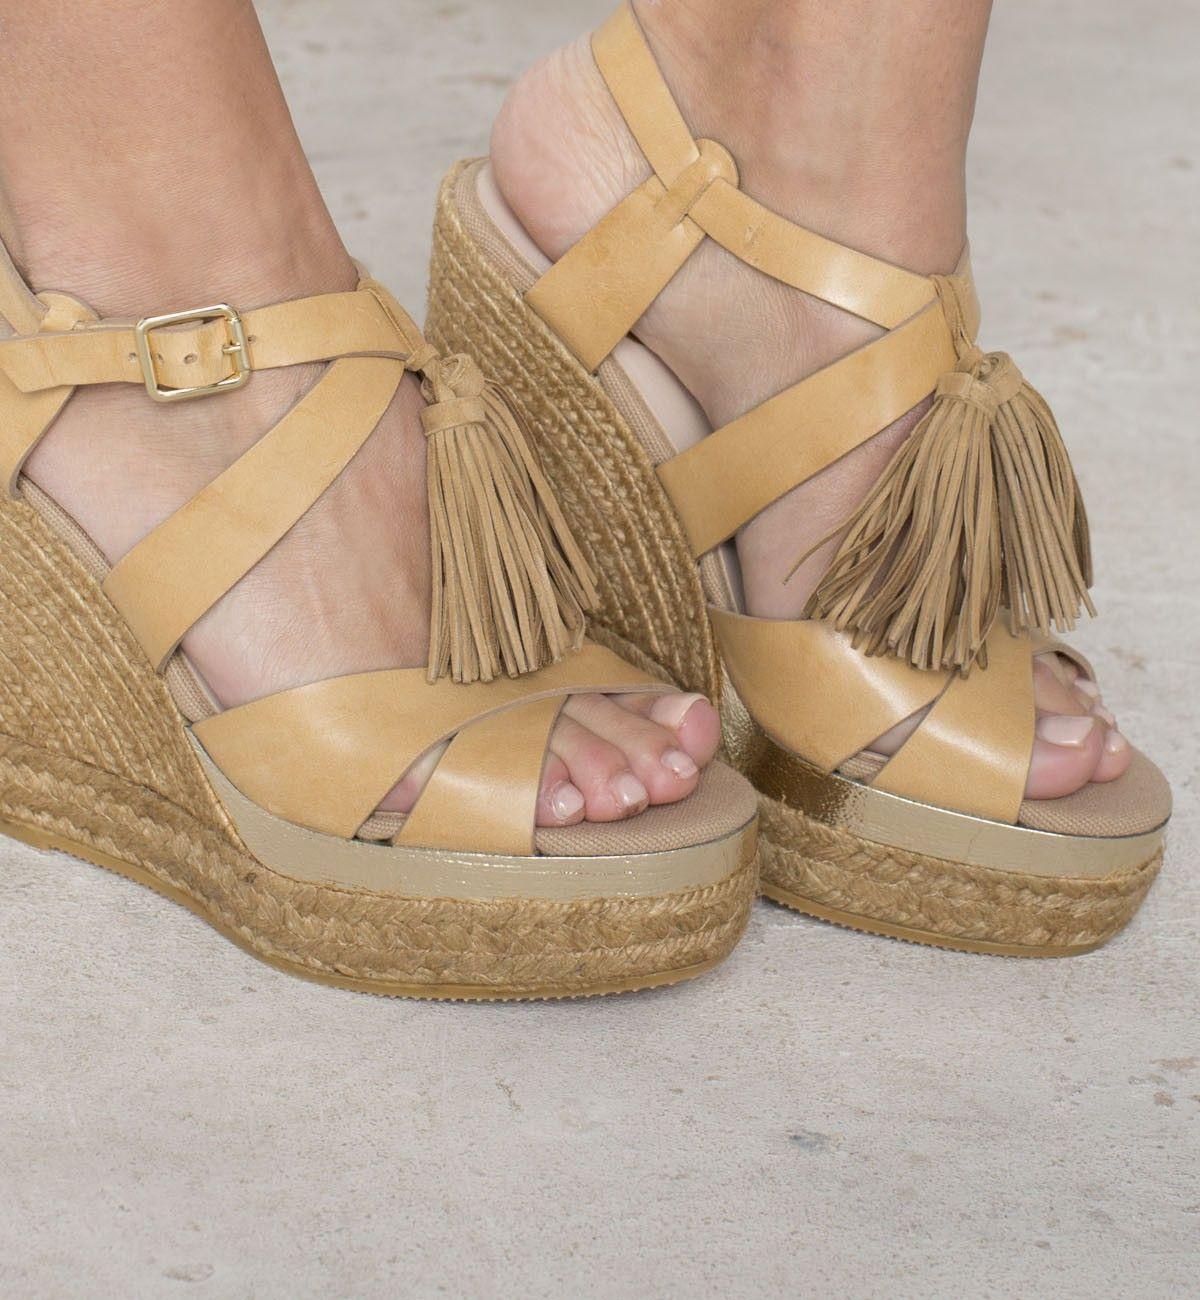 4cc076d2c64 Alpargata cuña borlas camel de Polín et moi - TrendyAdvisor   shoes ...